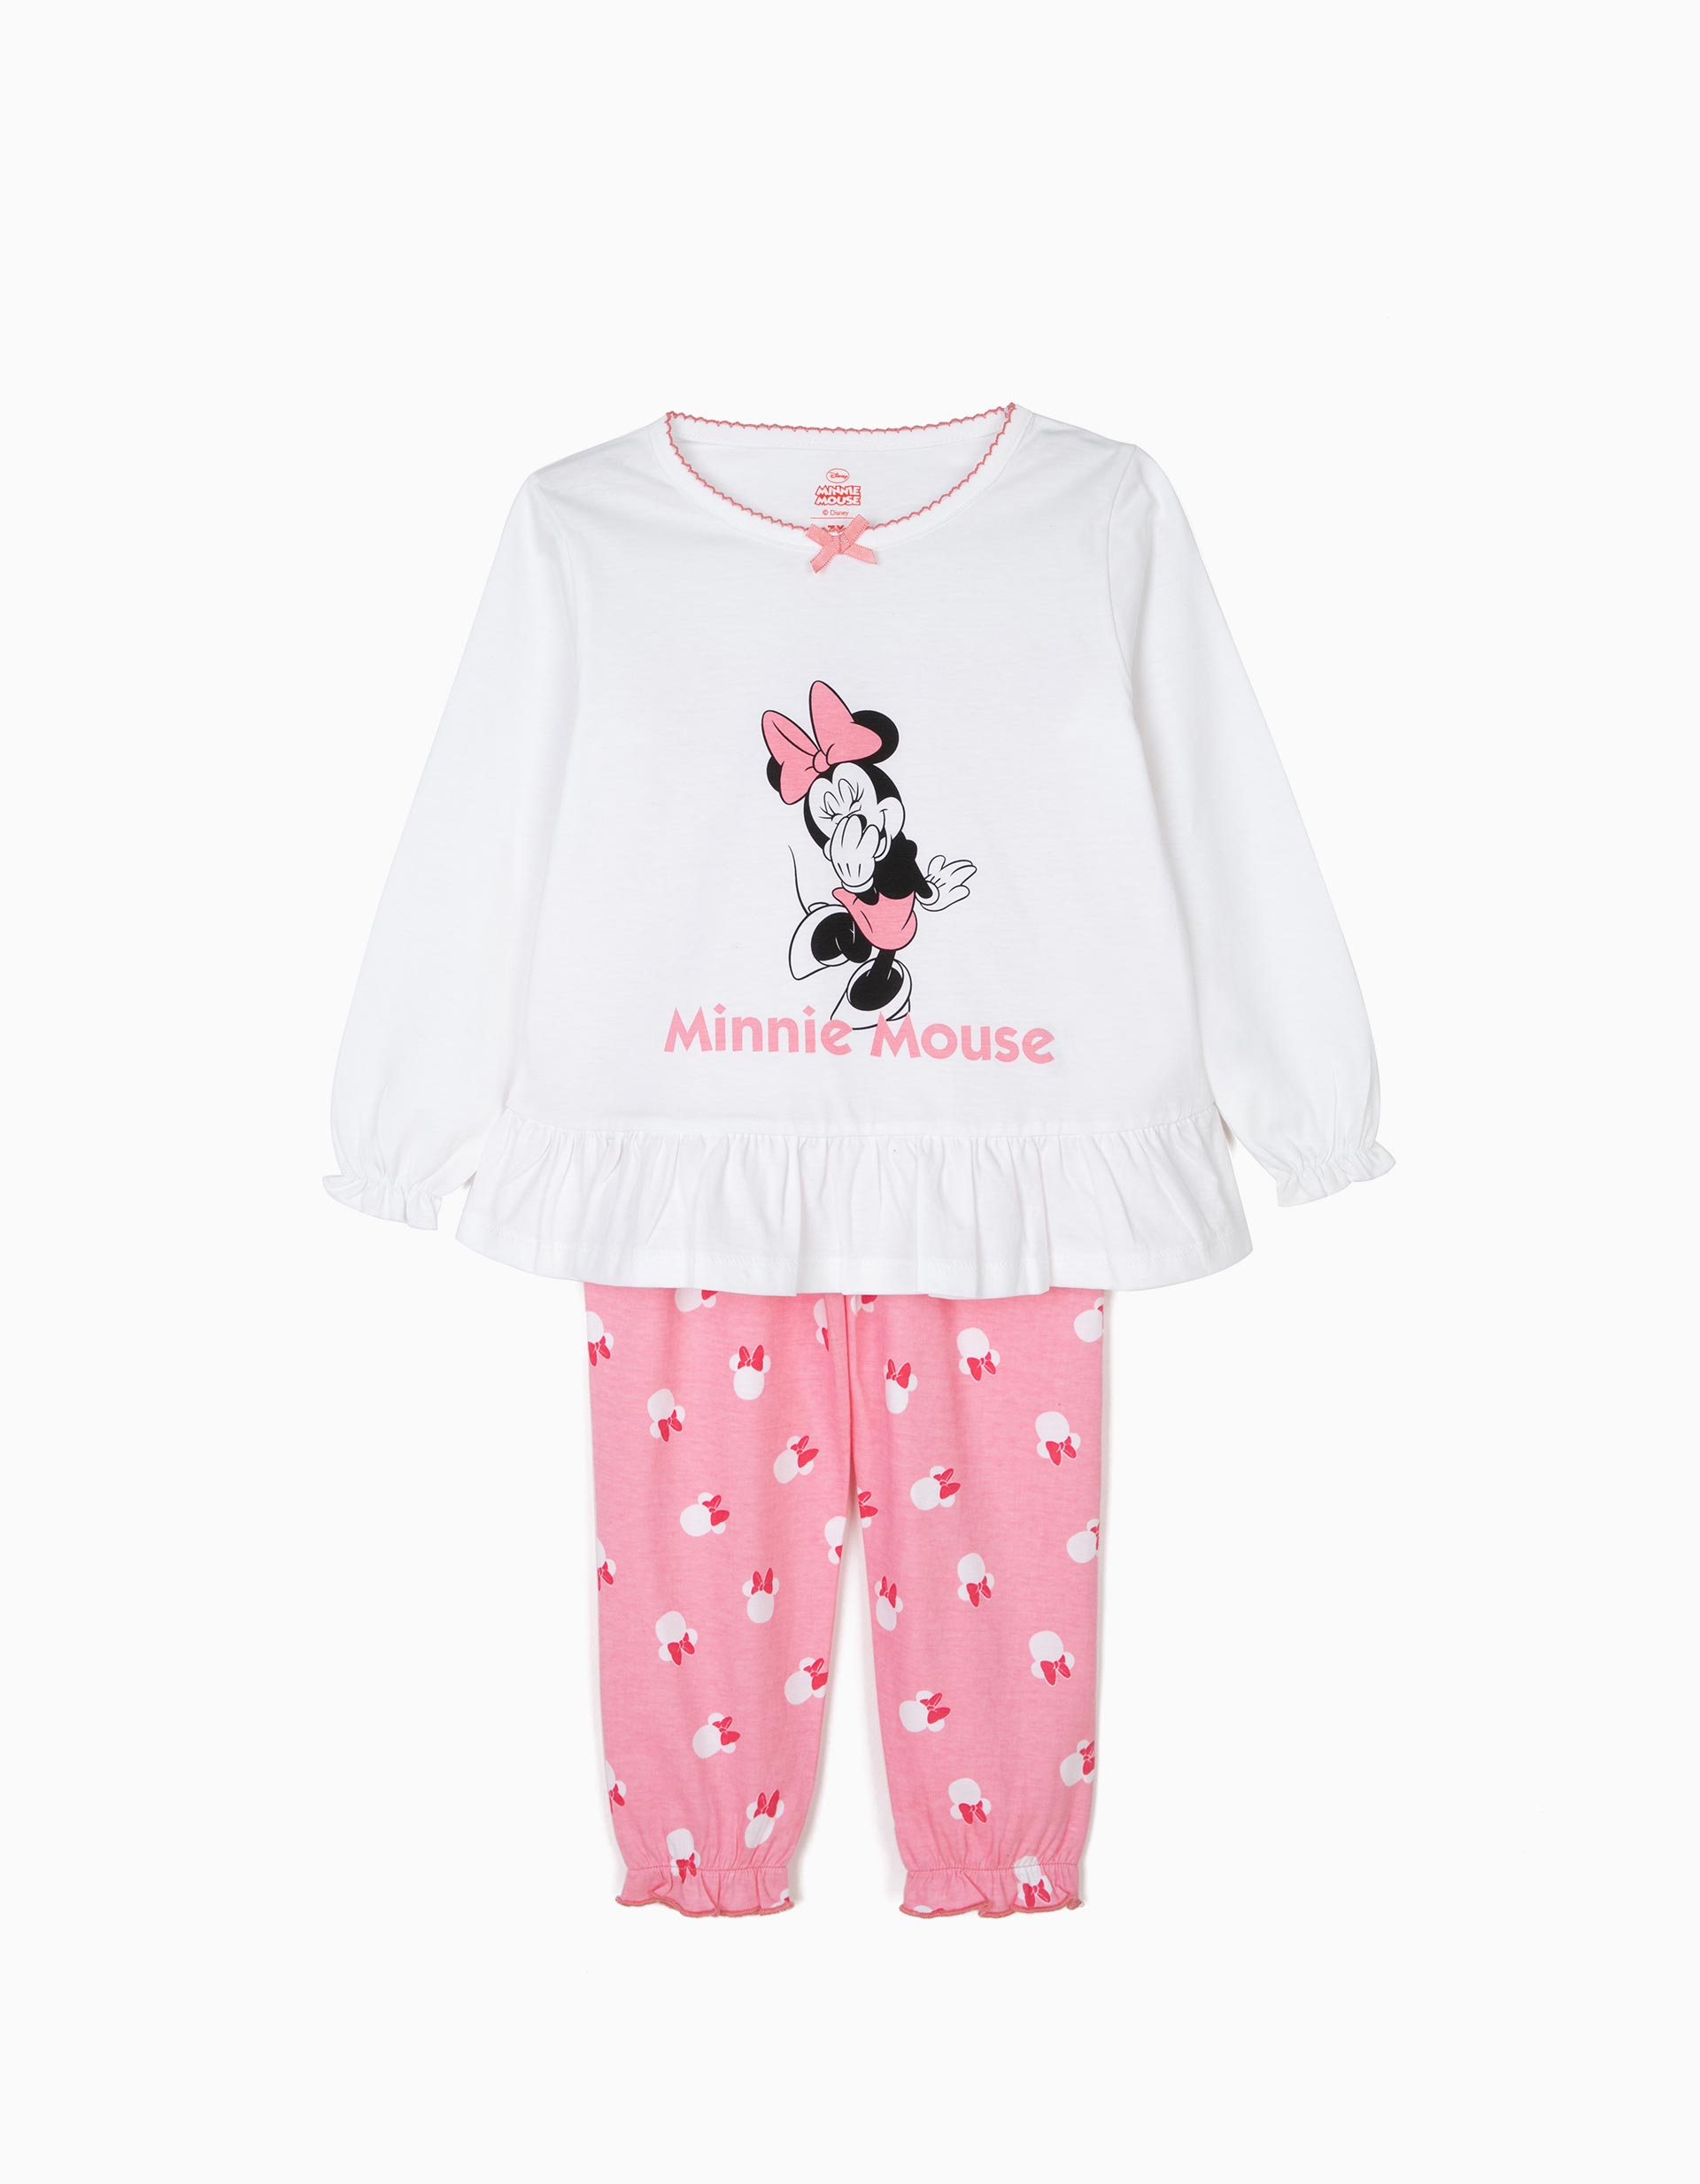 Pantal/ón de Jogging para ni/ña de 3 a 8 a/ños Disney Minnie Mouse